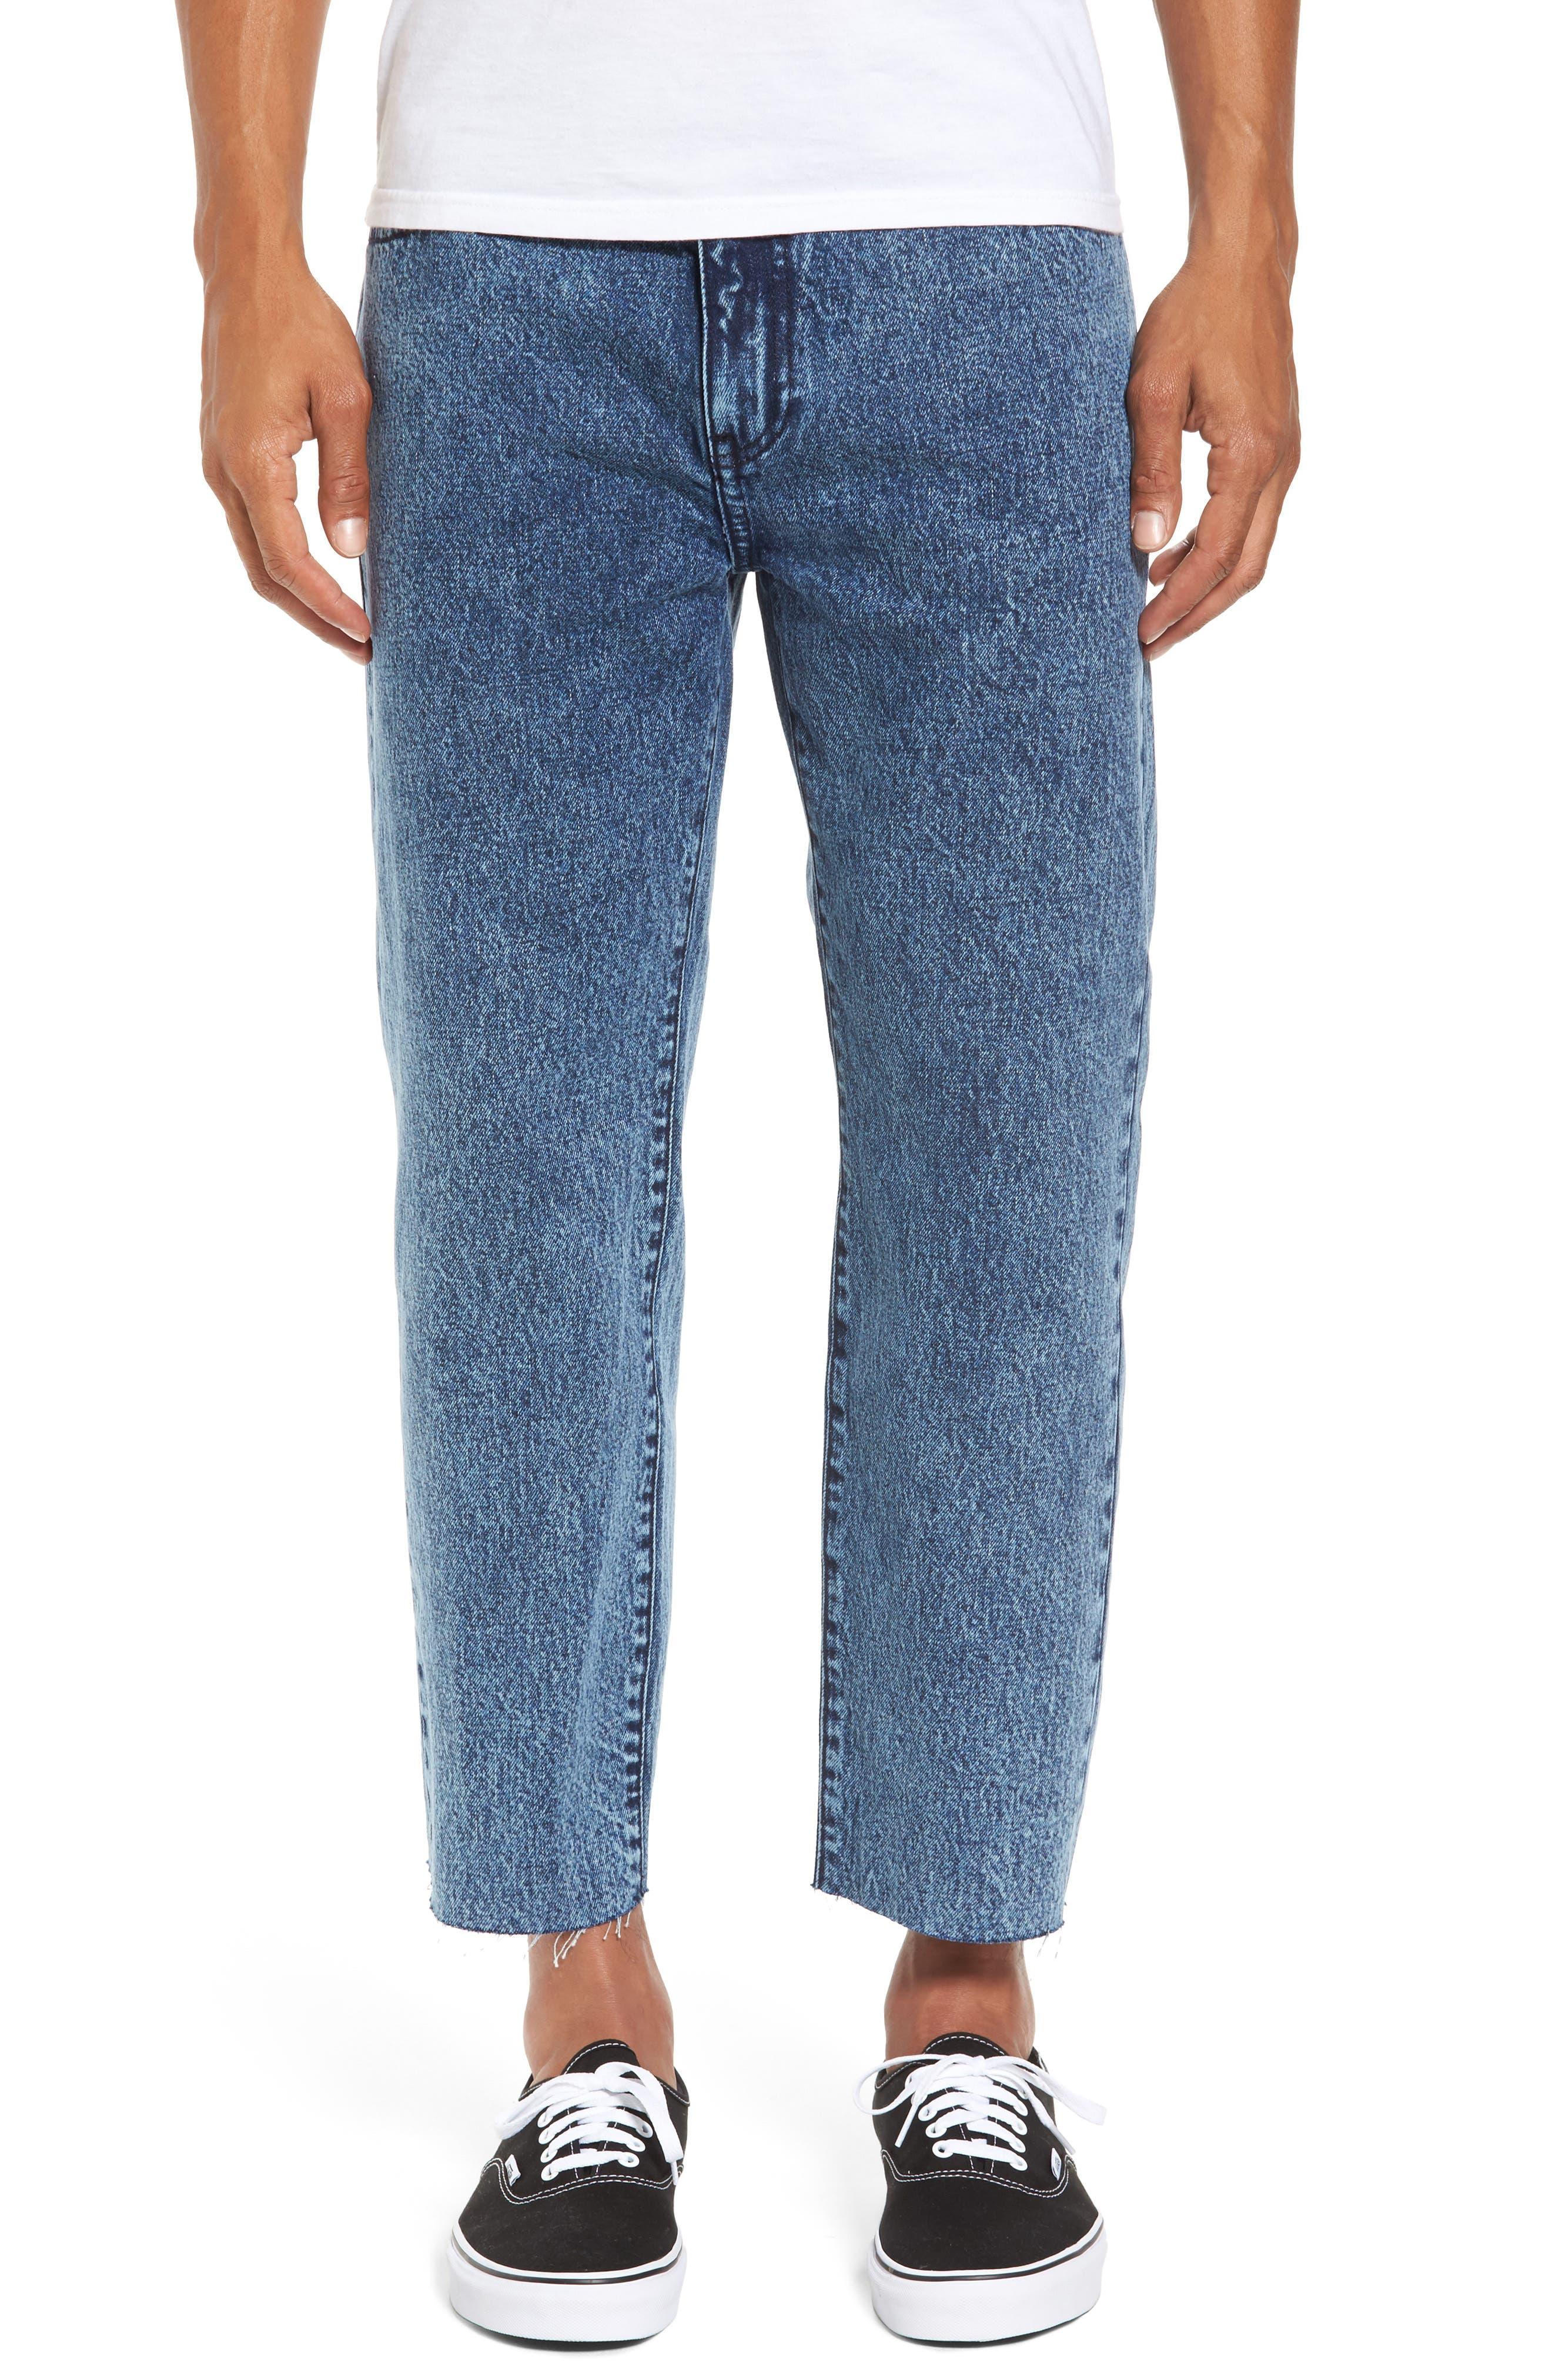 Otis Straight Fit Crop Jeans,                         Main,                         color, Acid Dark Blue Raw Hem